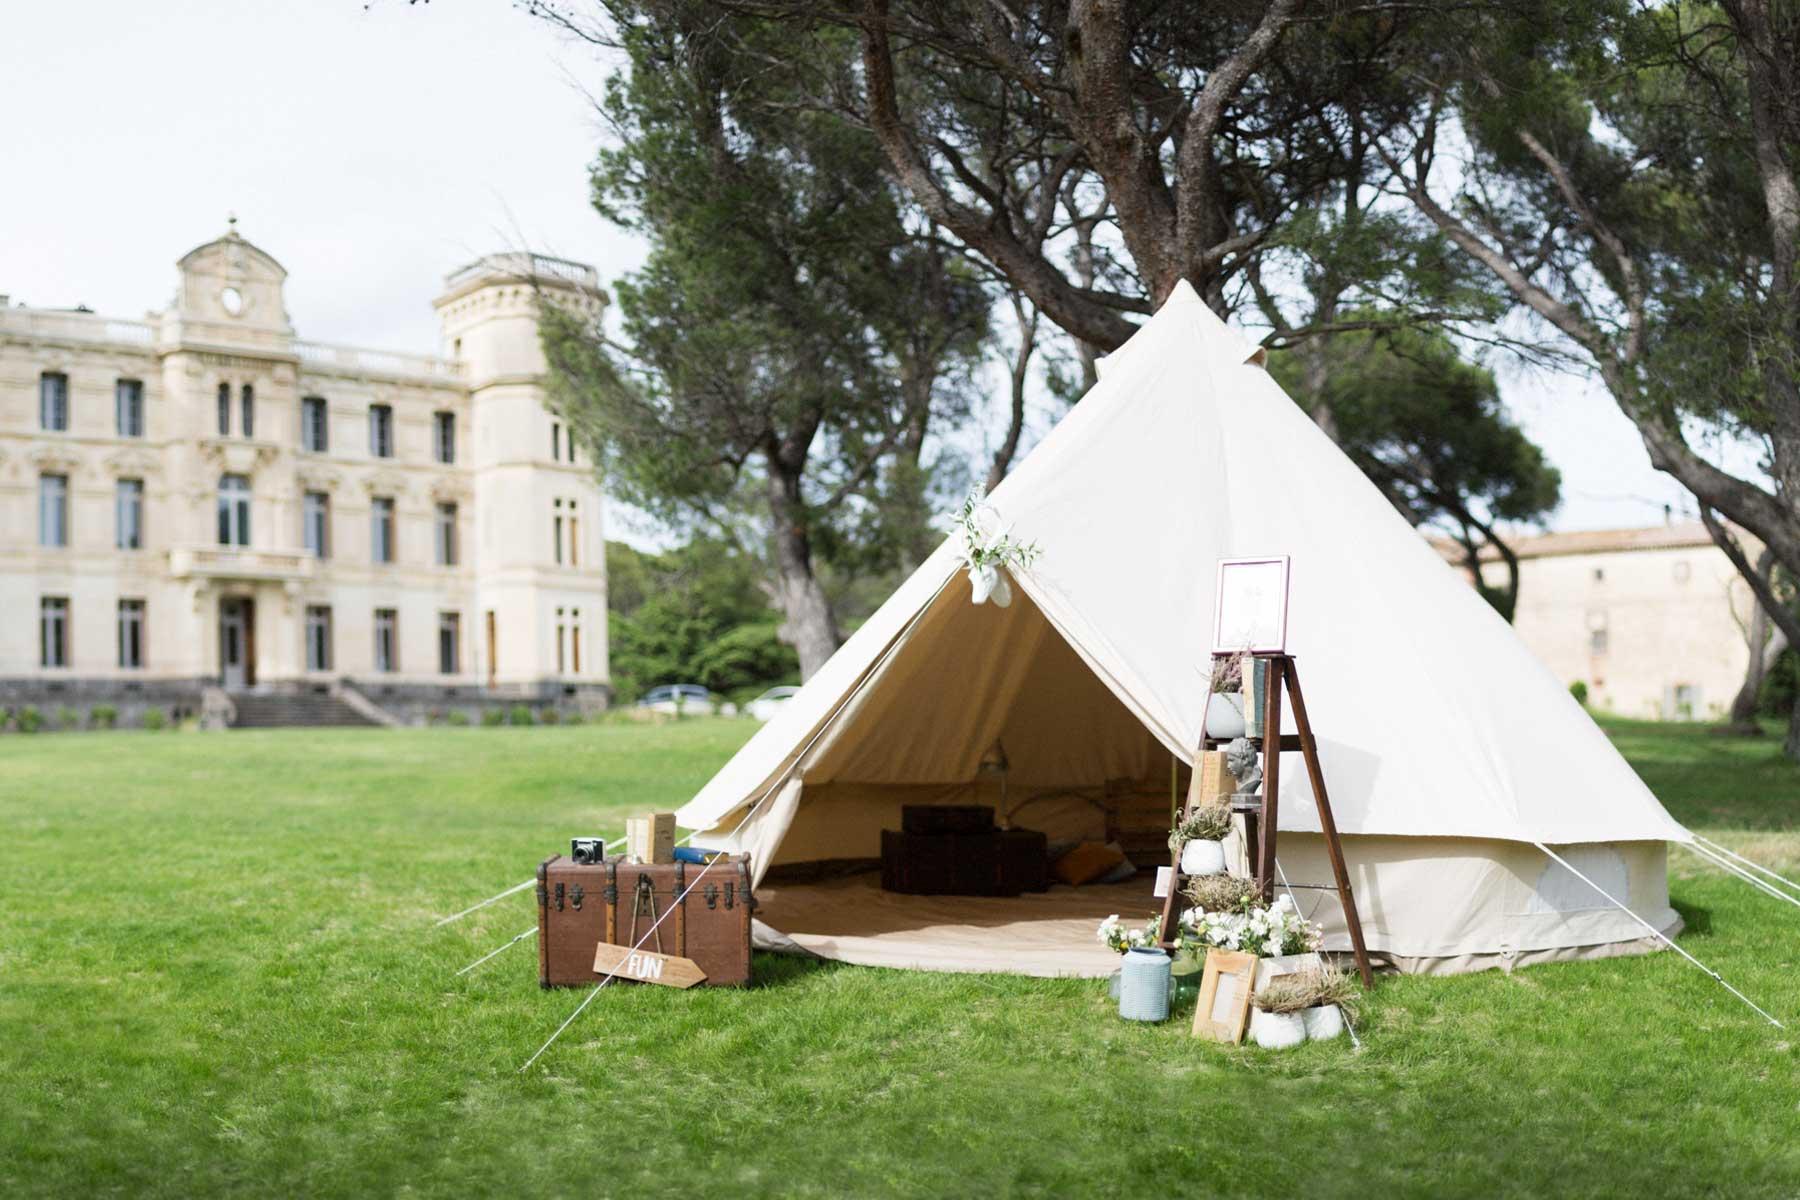 location tente mariage retro mon wedding camping. Black Bedroom Furniture Sets. Home Design Ideas